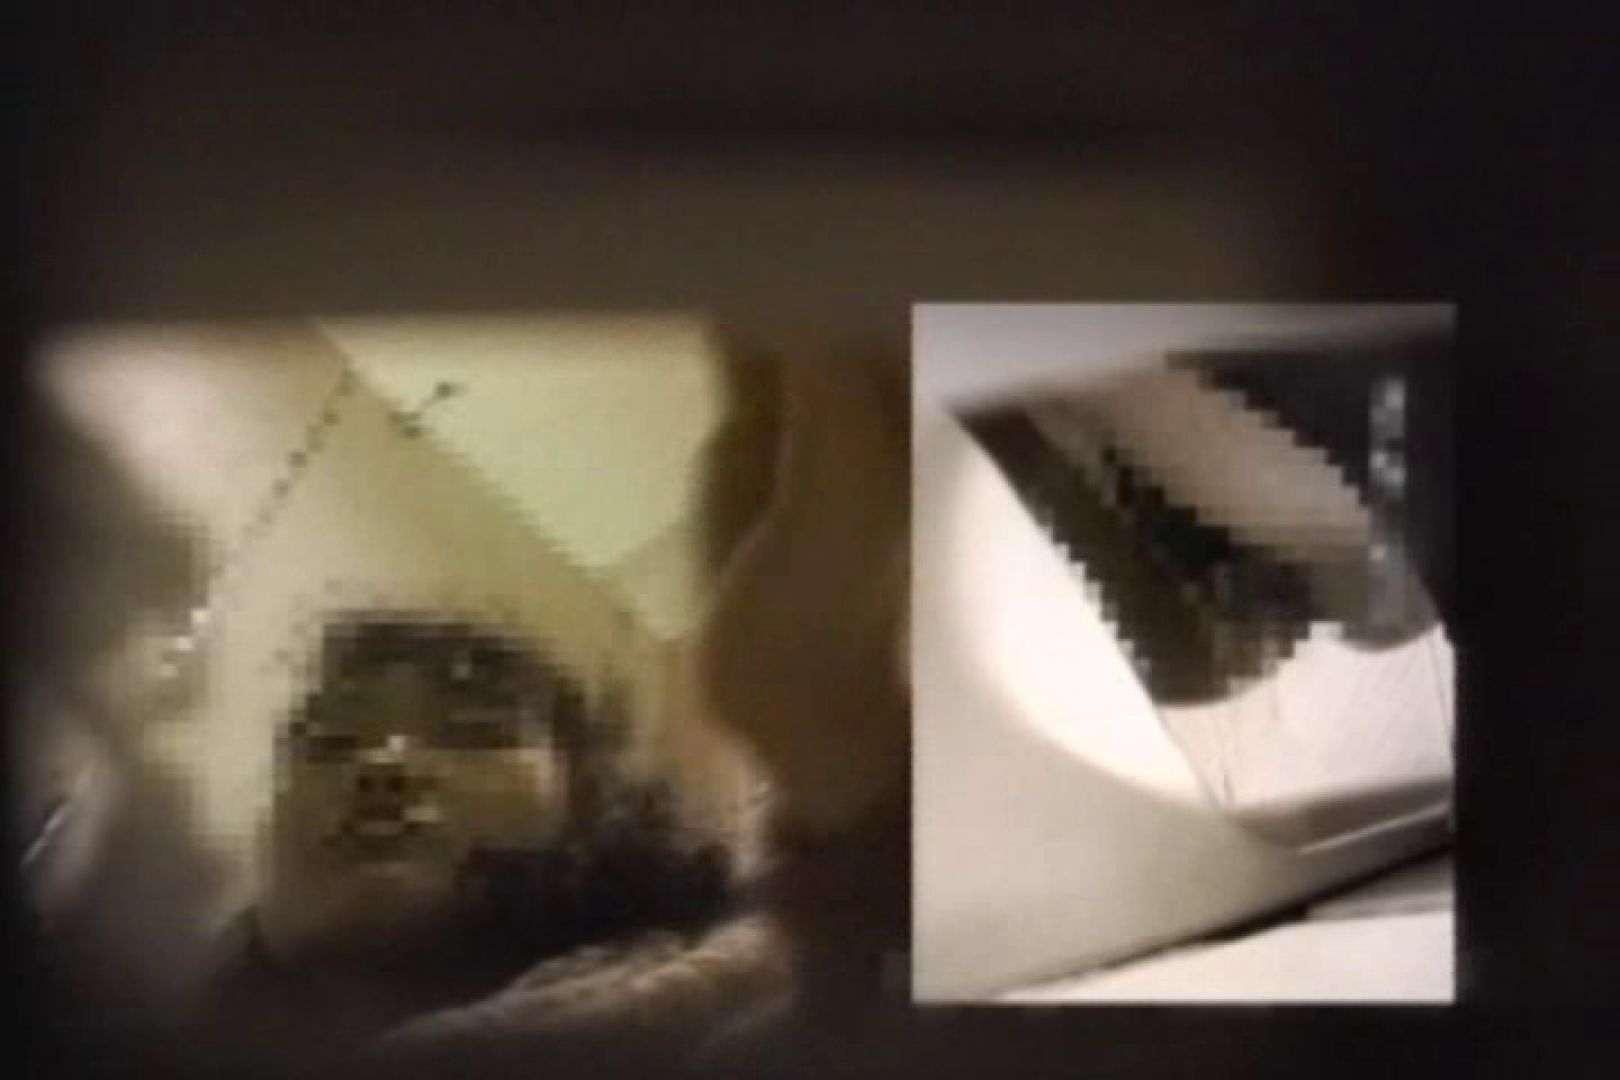 STY-013 実録!2カメde女子洗面所 名作 のぞき動画画像 52連発 17